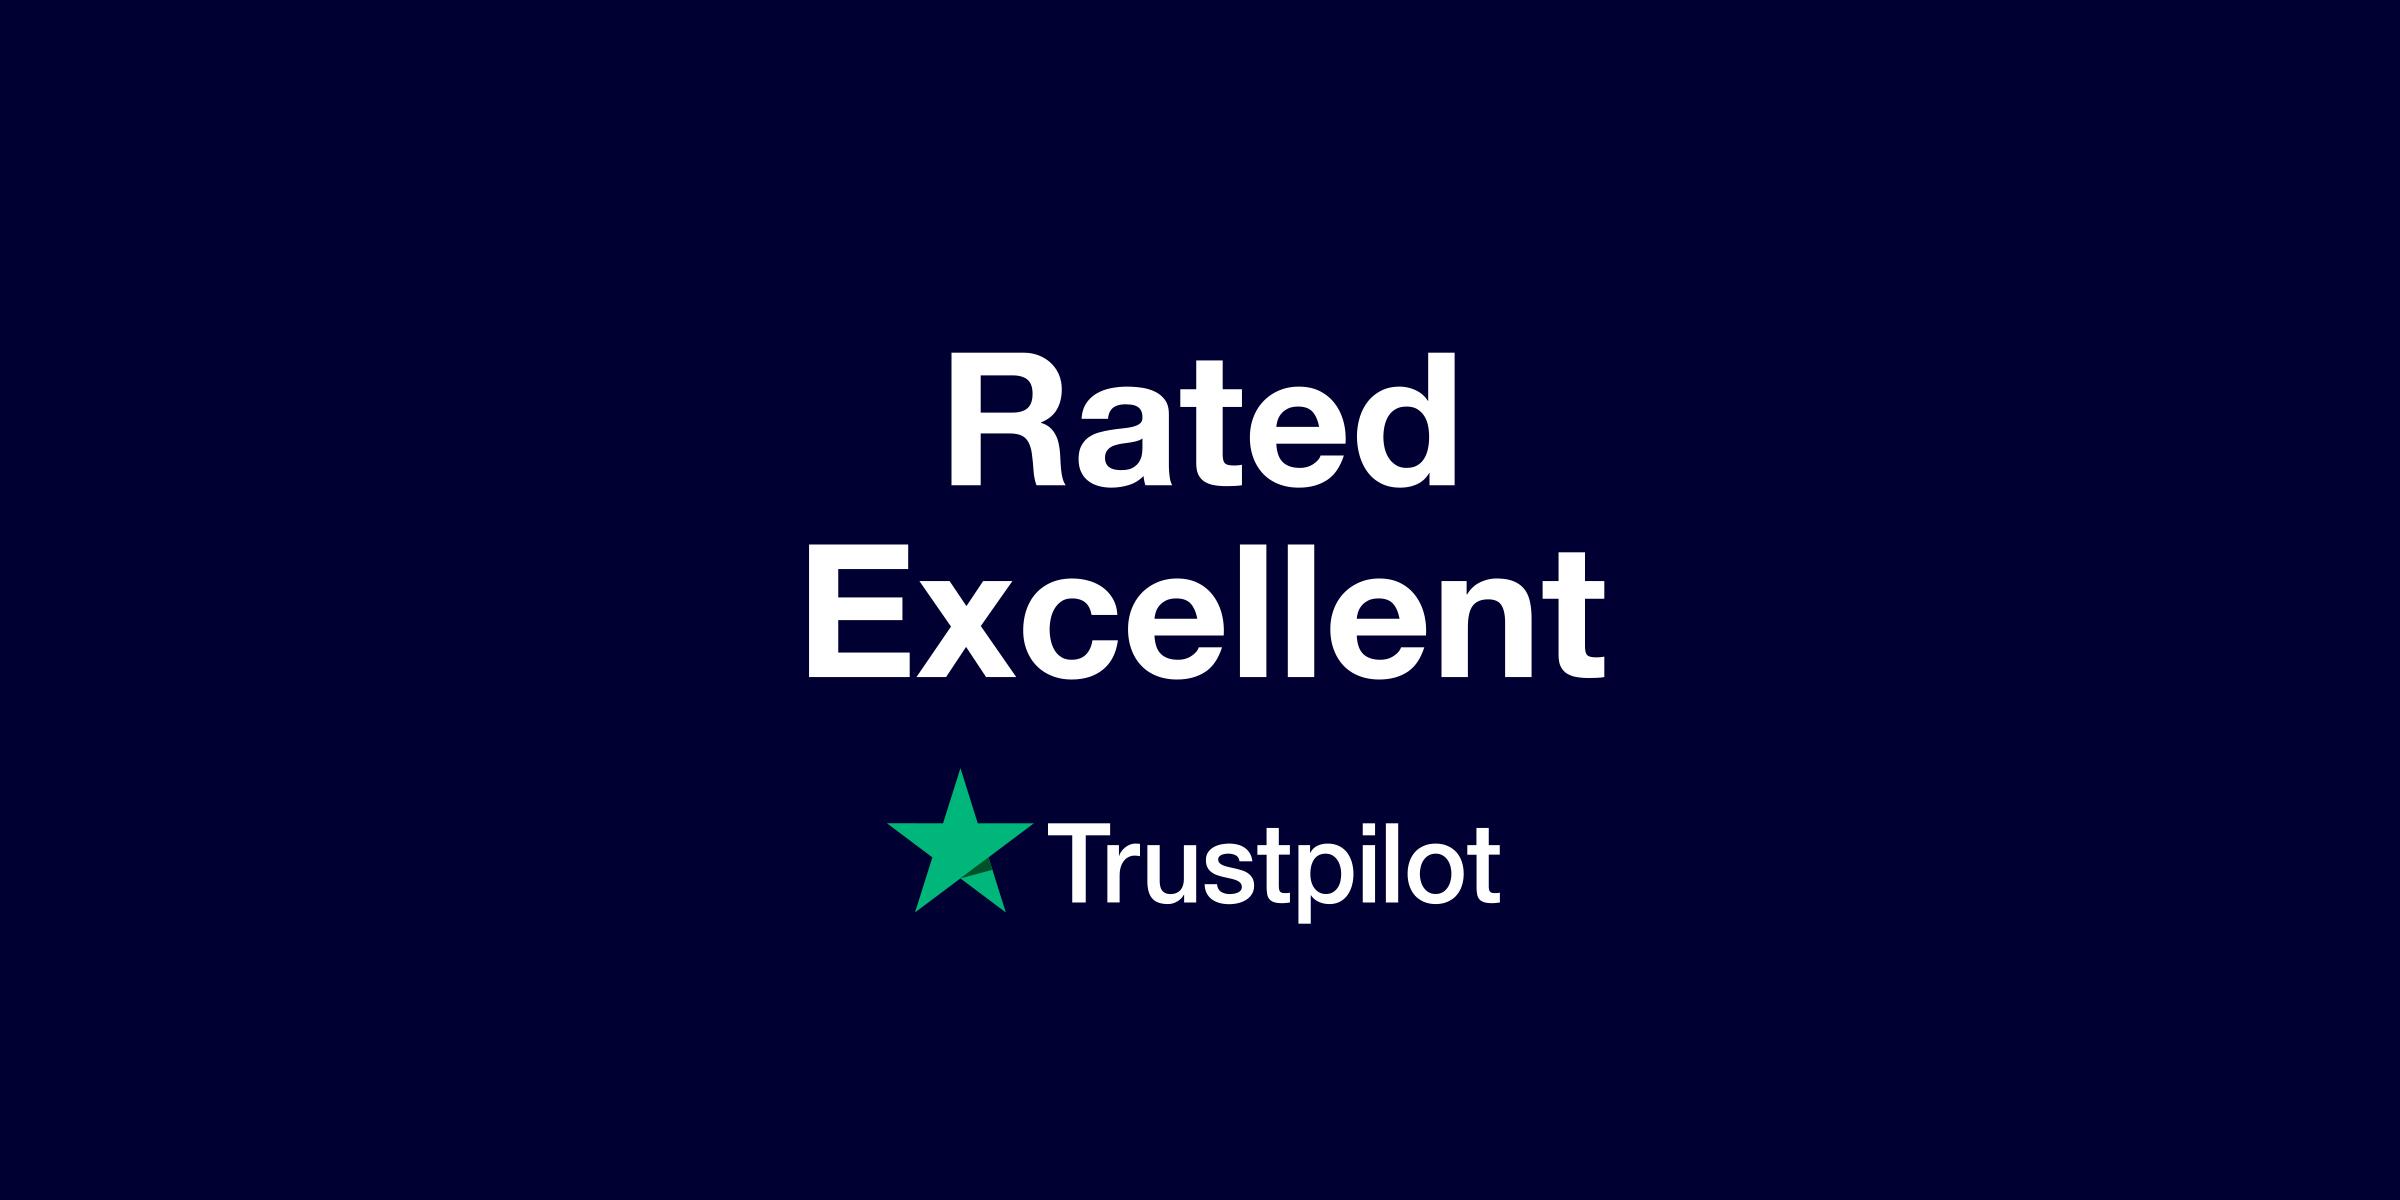 trustpilot-home-uk.jpg